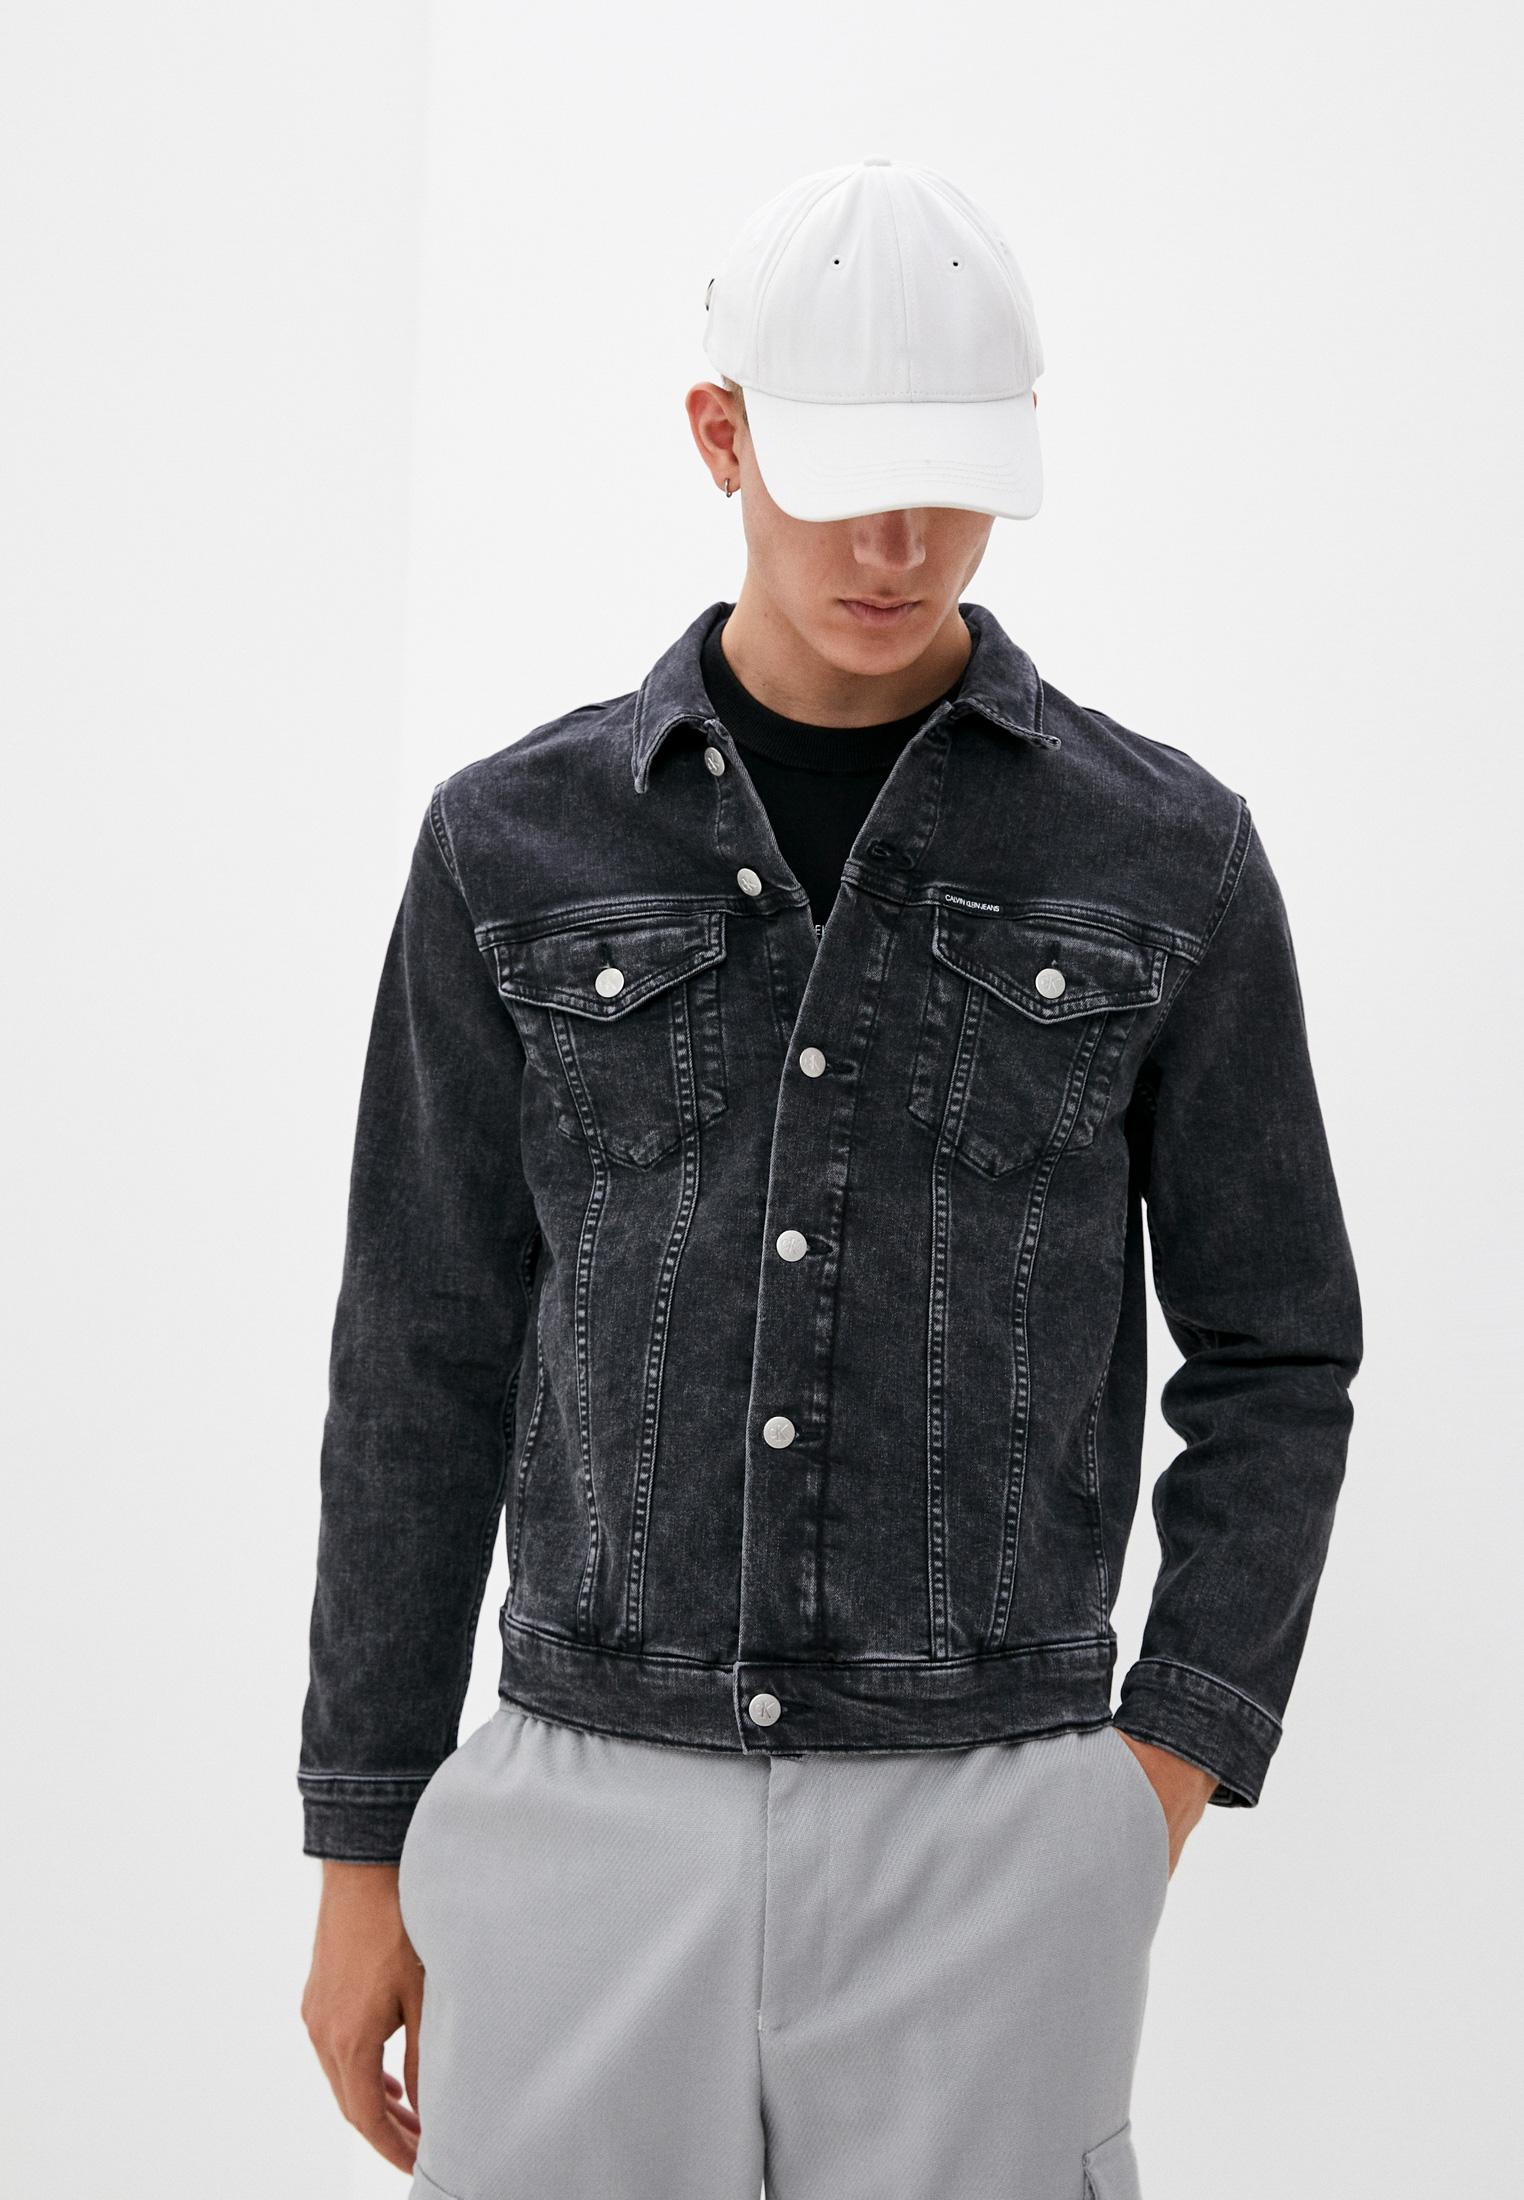 Джинсовая куртка Calvin Klein Jeans Куртка джинсовая Calvin Klein Jeans